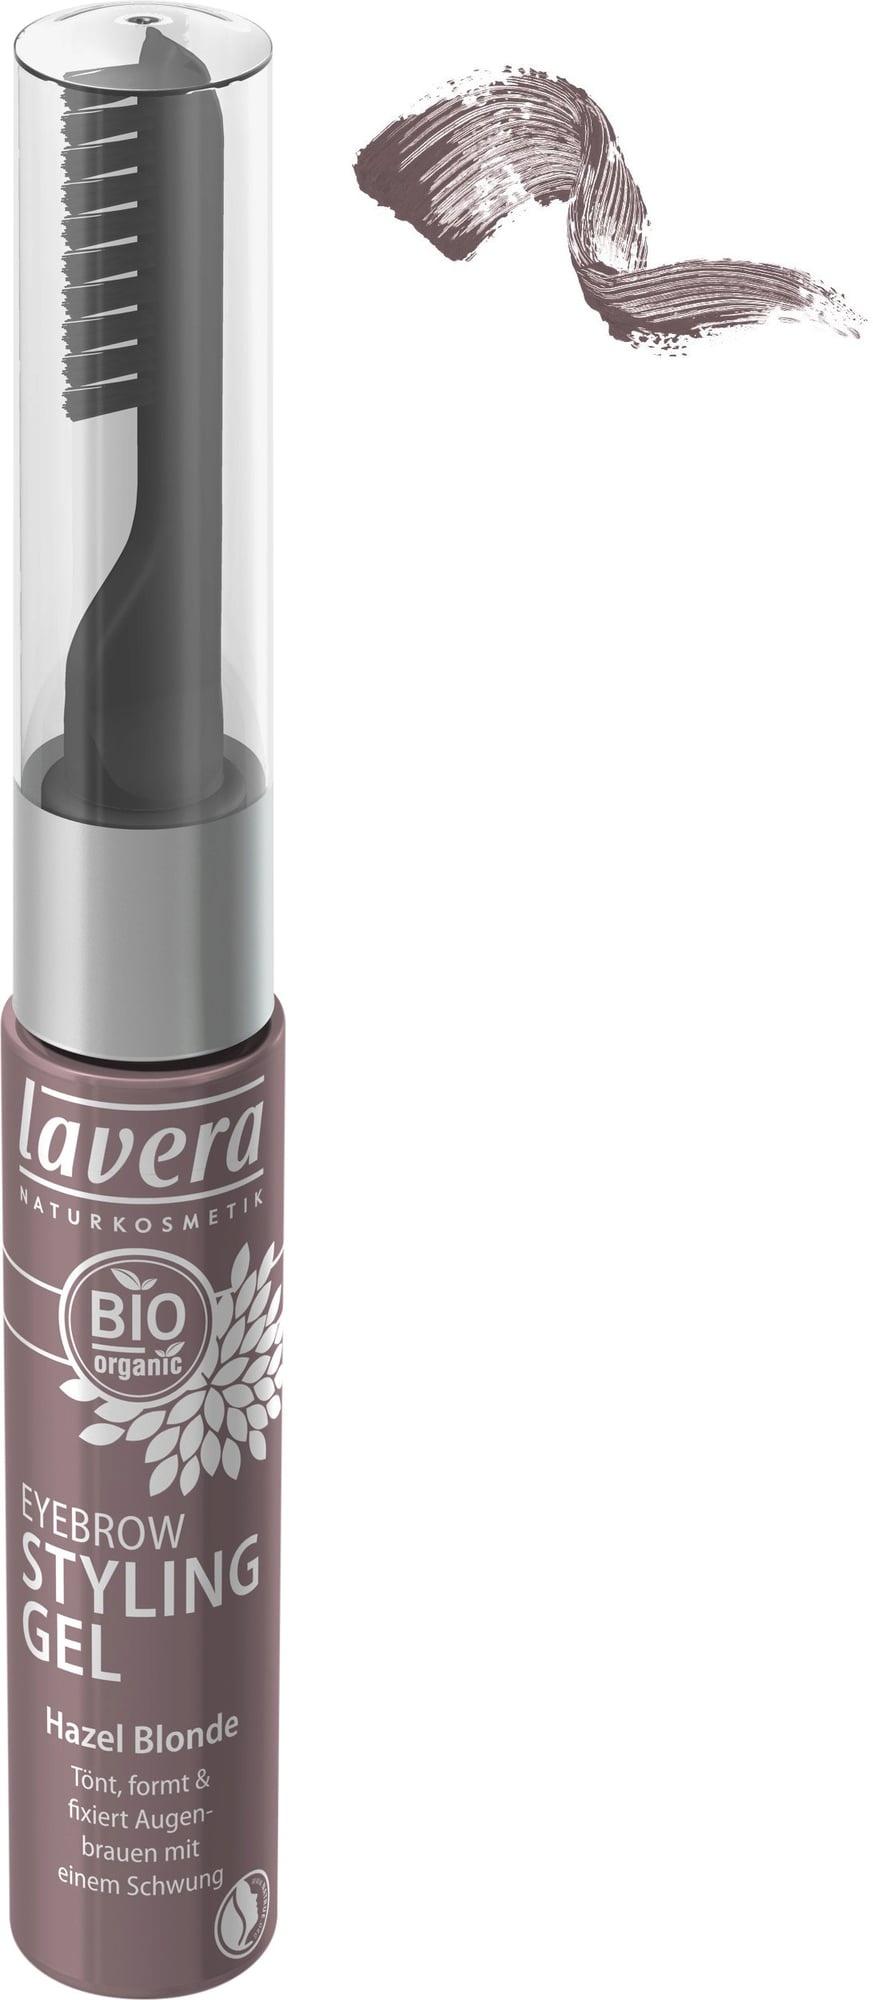 Lavera Trend Eyebrow Styling Gel 9ml - Hazel Blonde